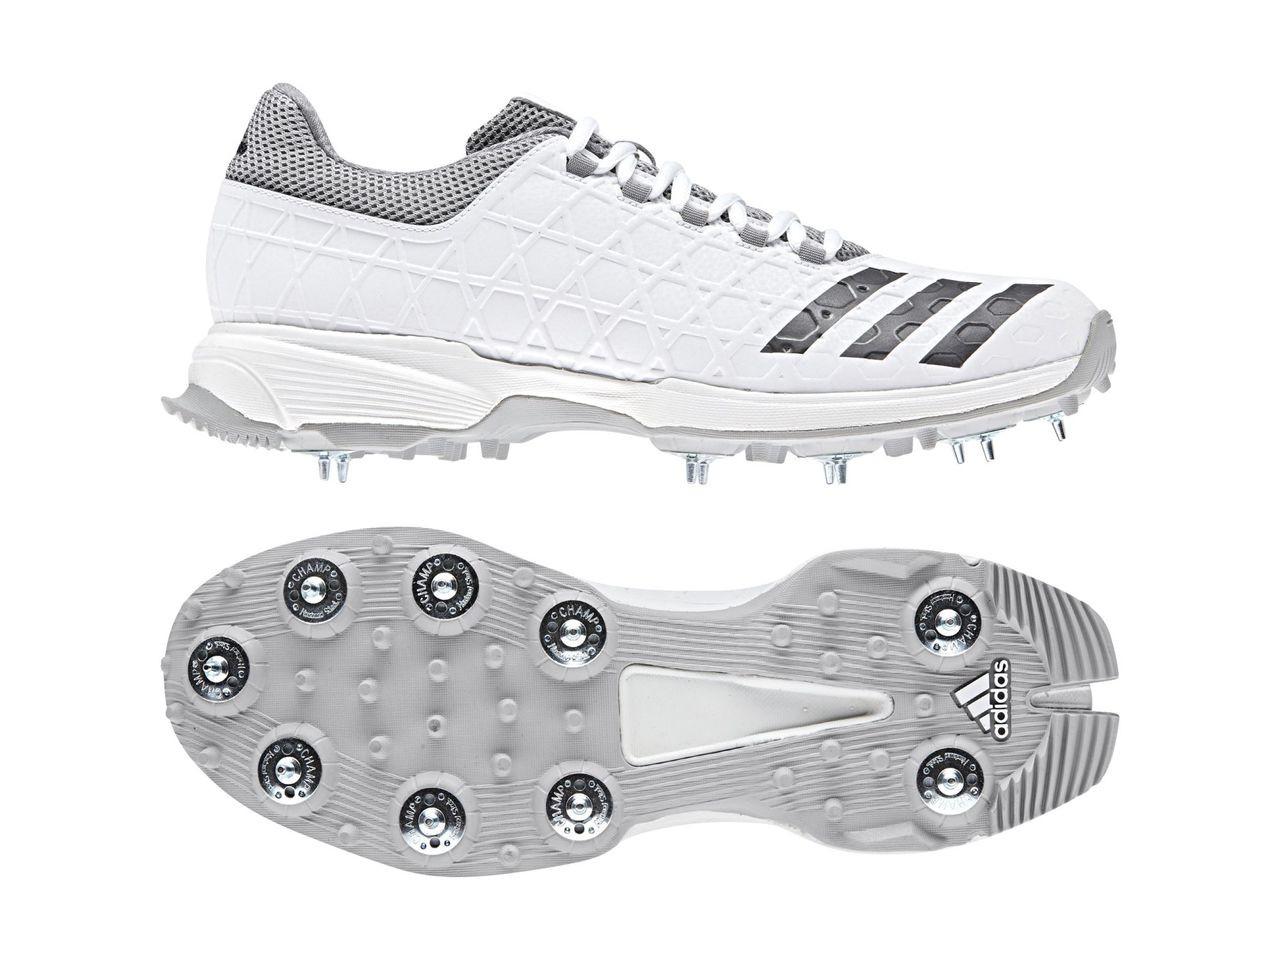 adidas bowling shoes cricket